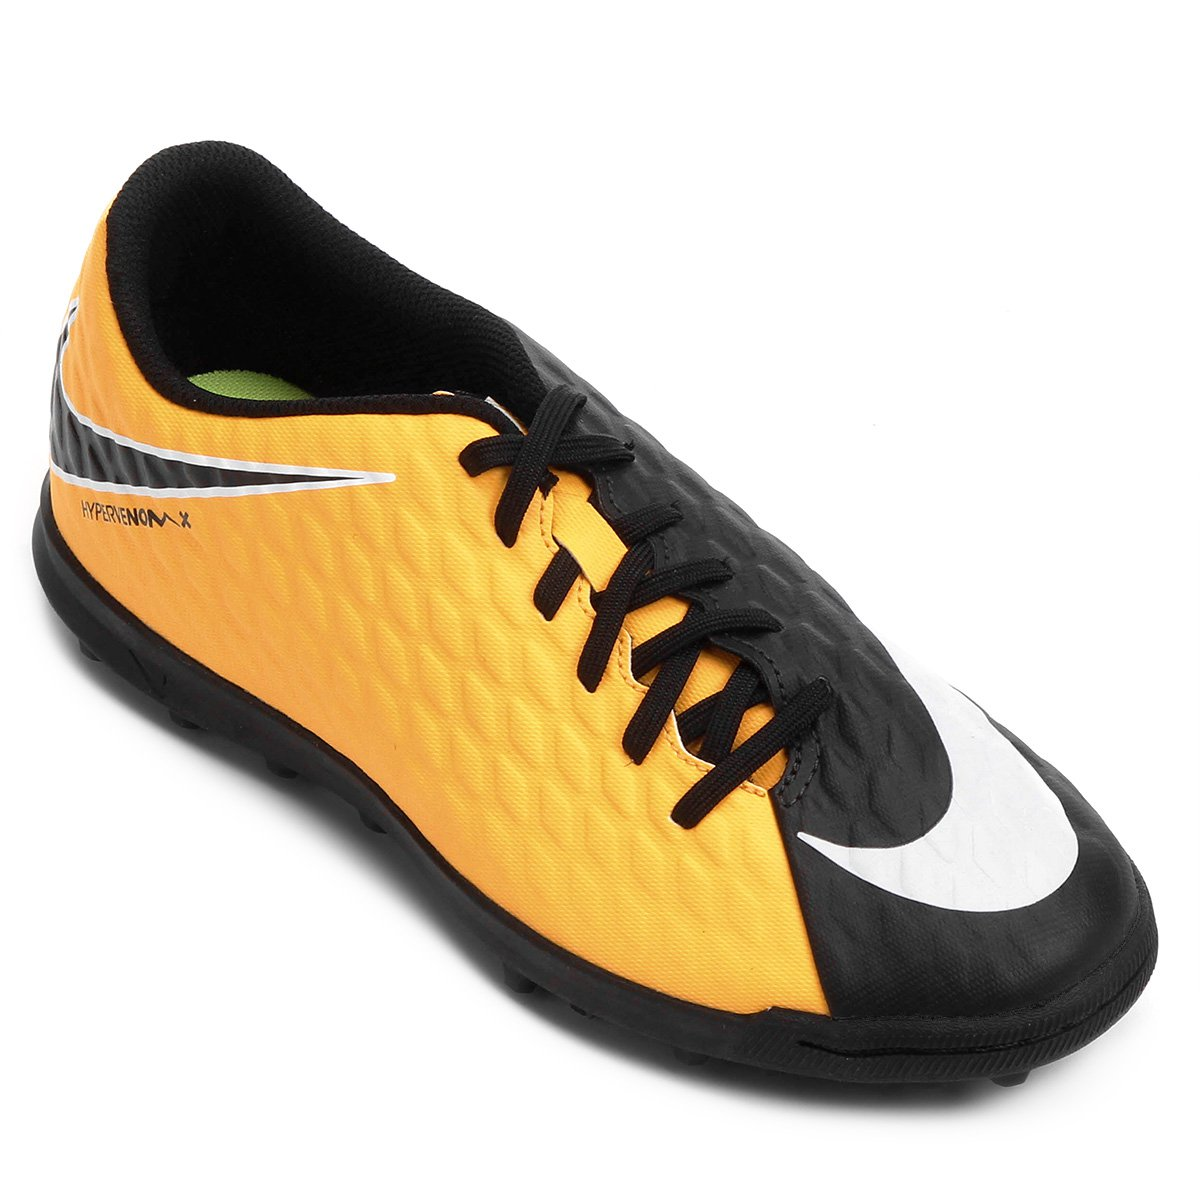 Chuteira Society Nike Hypervenom Phade 3 - Laranja e Preto - Compre ... 773c299cd536c